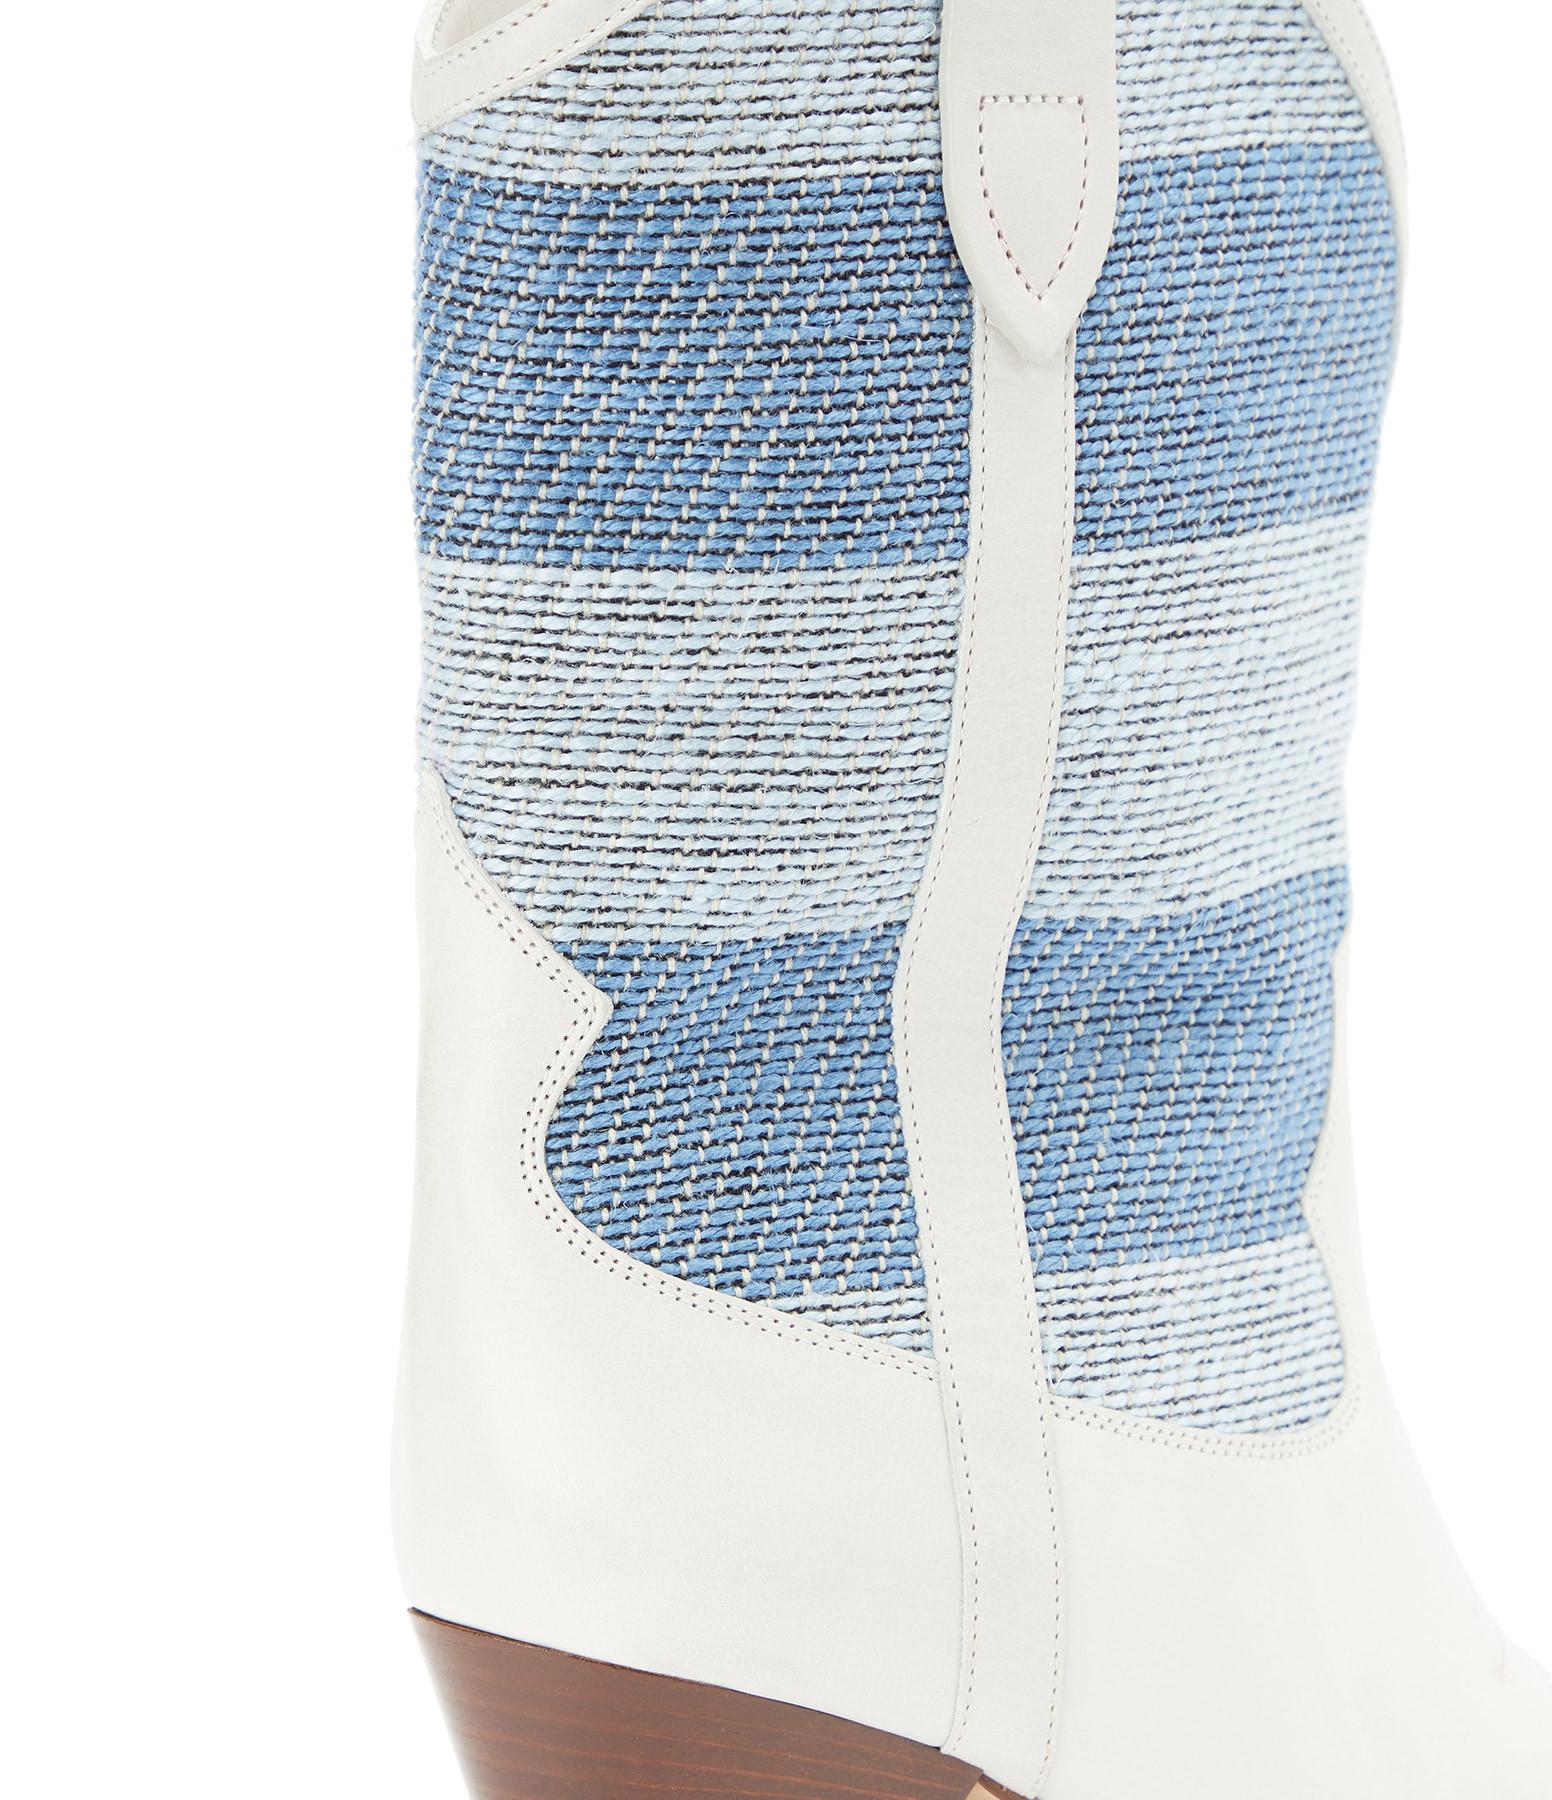 ISABEL MARANT - Bottes Luliette Bleu